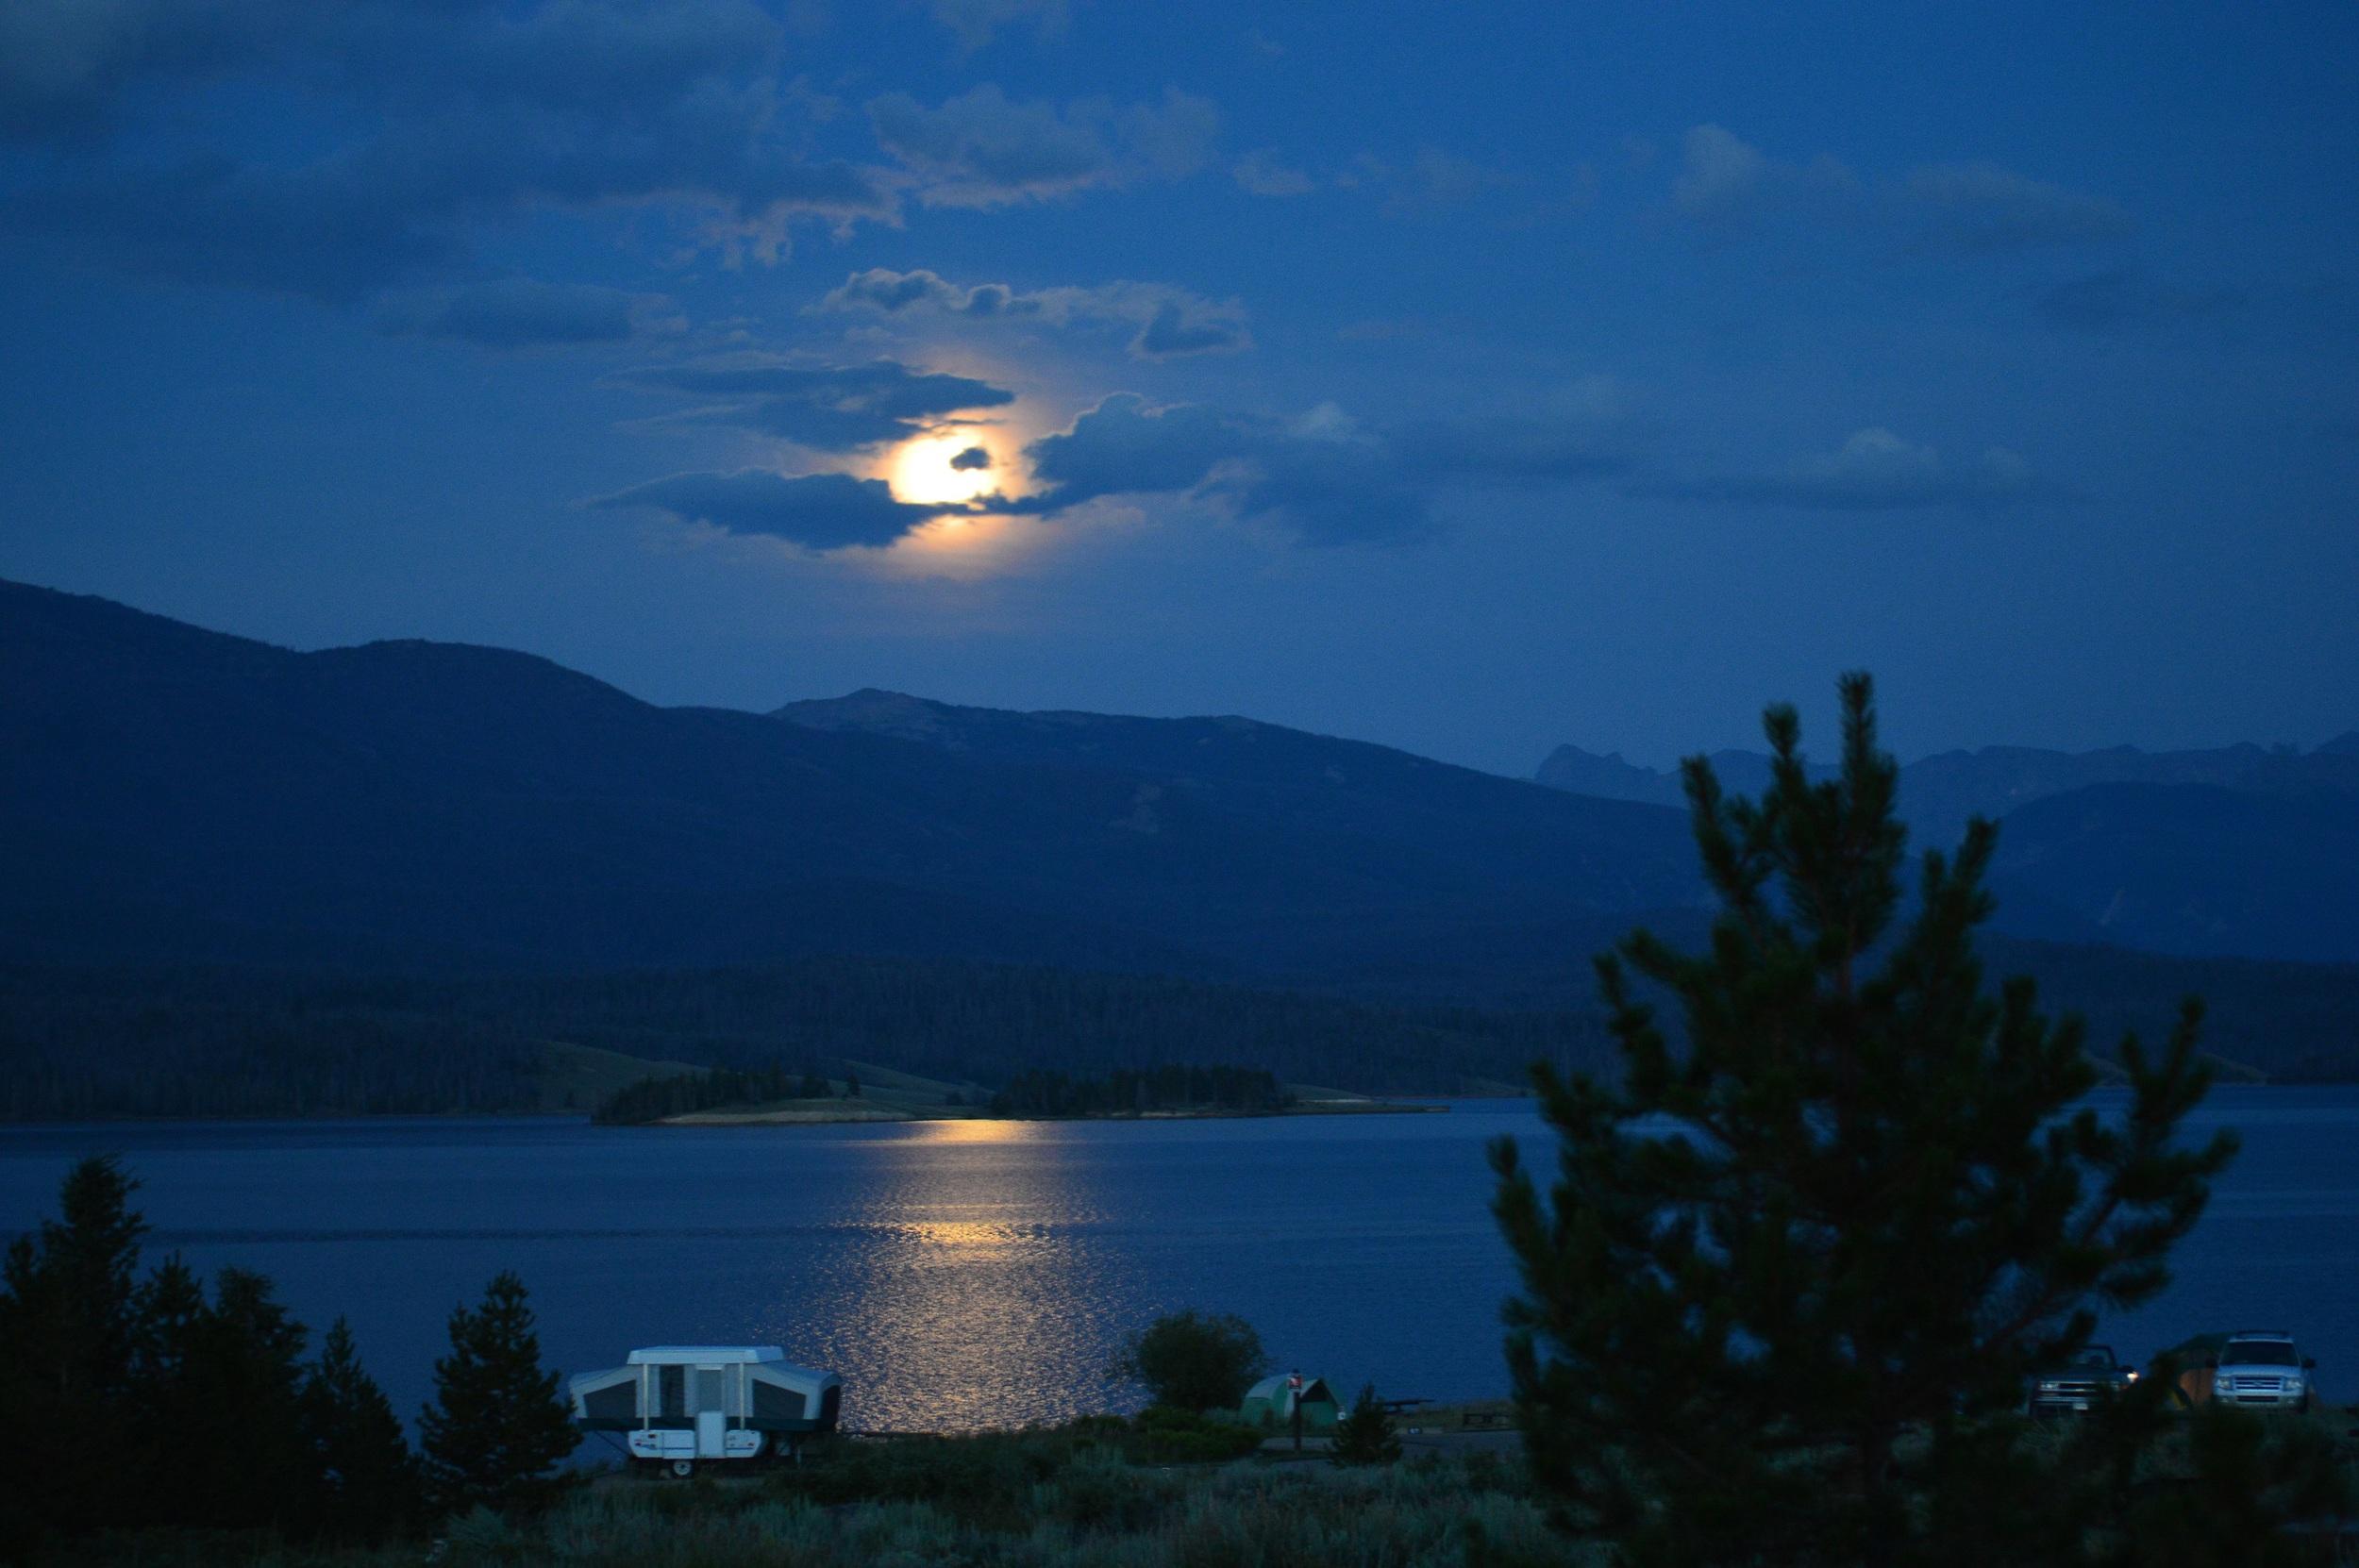 Moon over Lake Granby